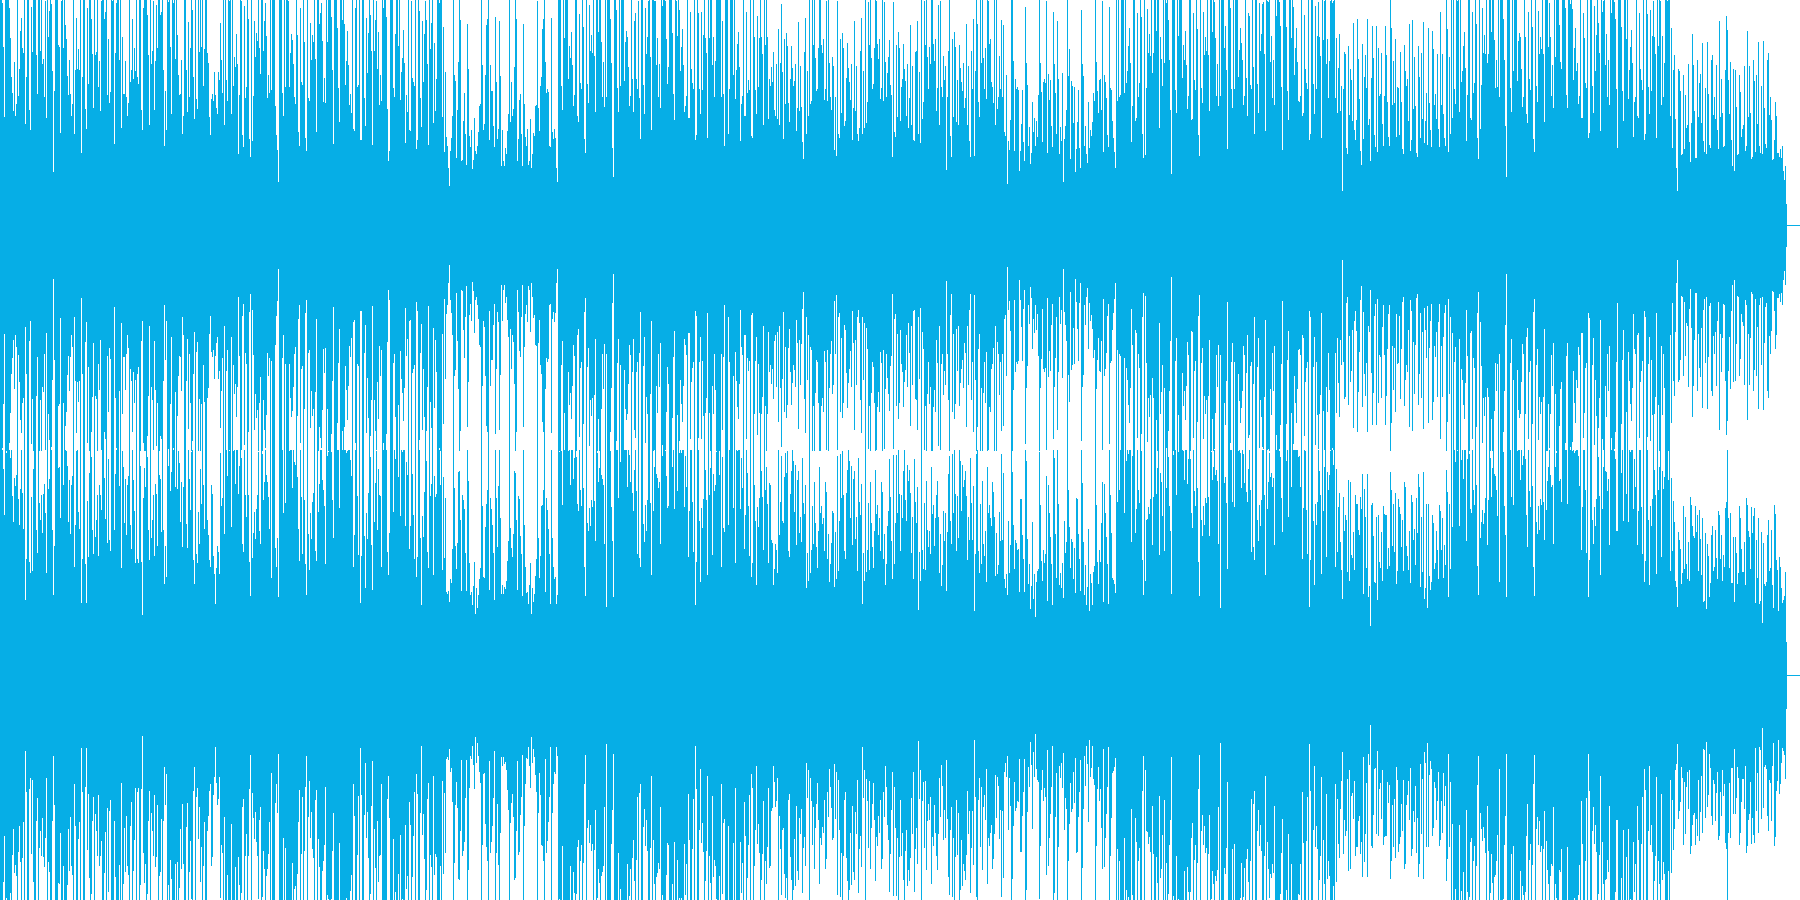 Lo-fiで幻想的なHIPHOP楽曲の再生済みの波形